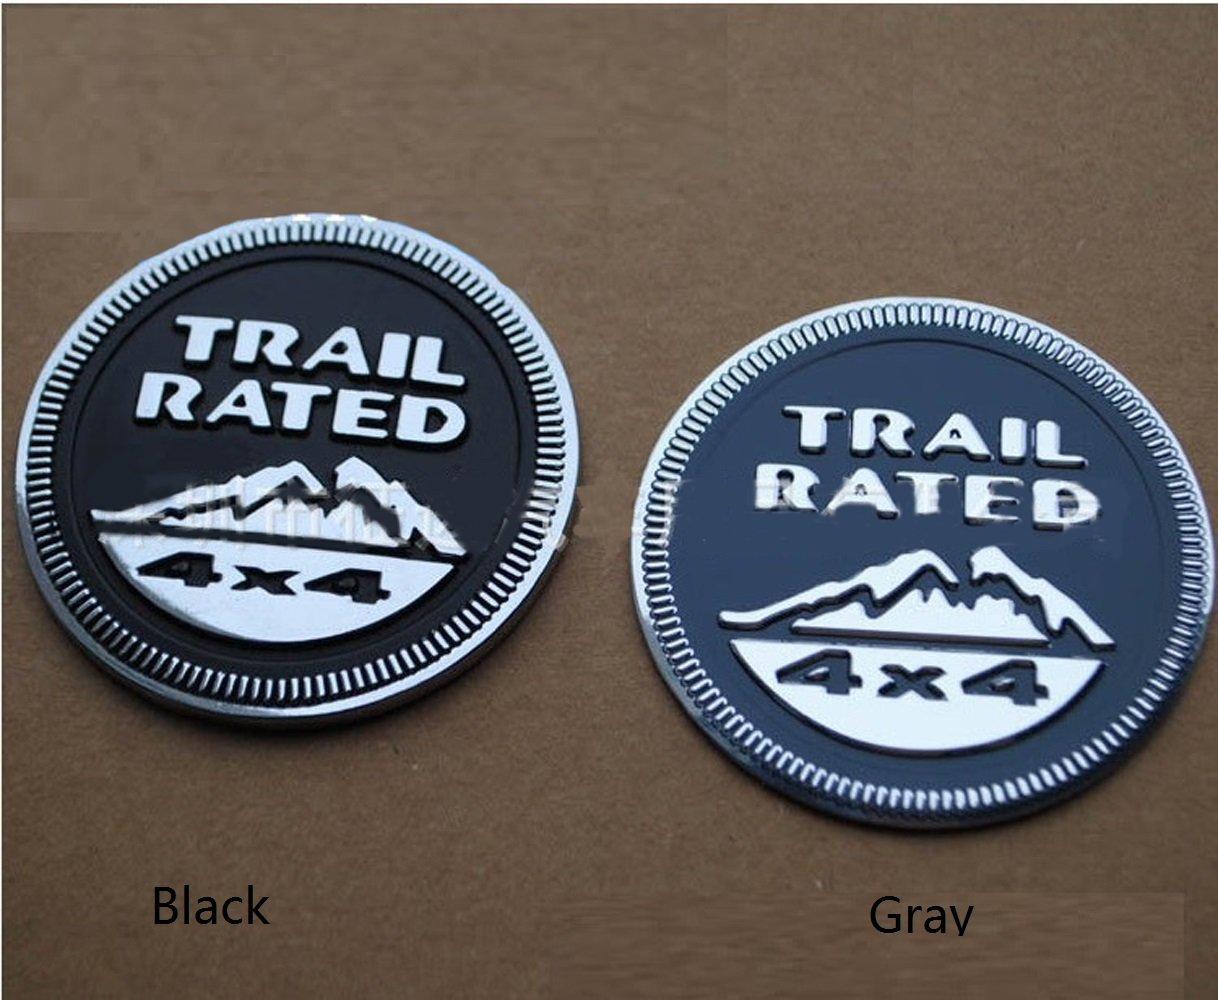 Oem for Jeep Trail Rated 4x4 Nameplate Emblem Wrangler Grand Cherokee Liberty Badge Sticky Back Logo Trailhawk 2014 Yoaoo-oem/® Auto Tuning 2pcs 1set Black